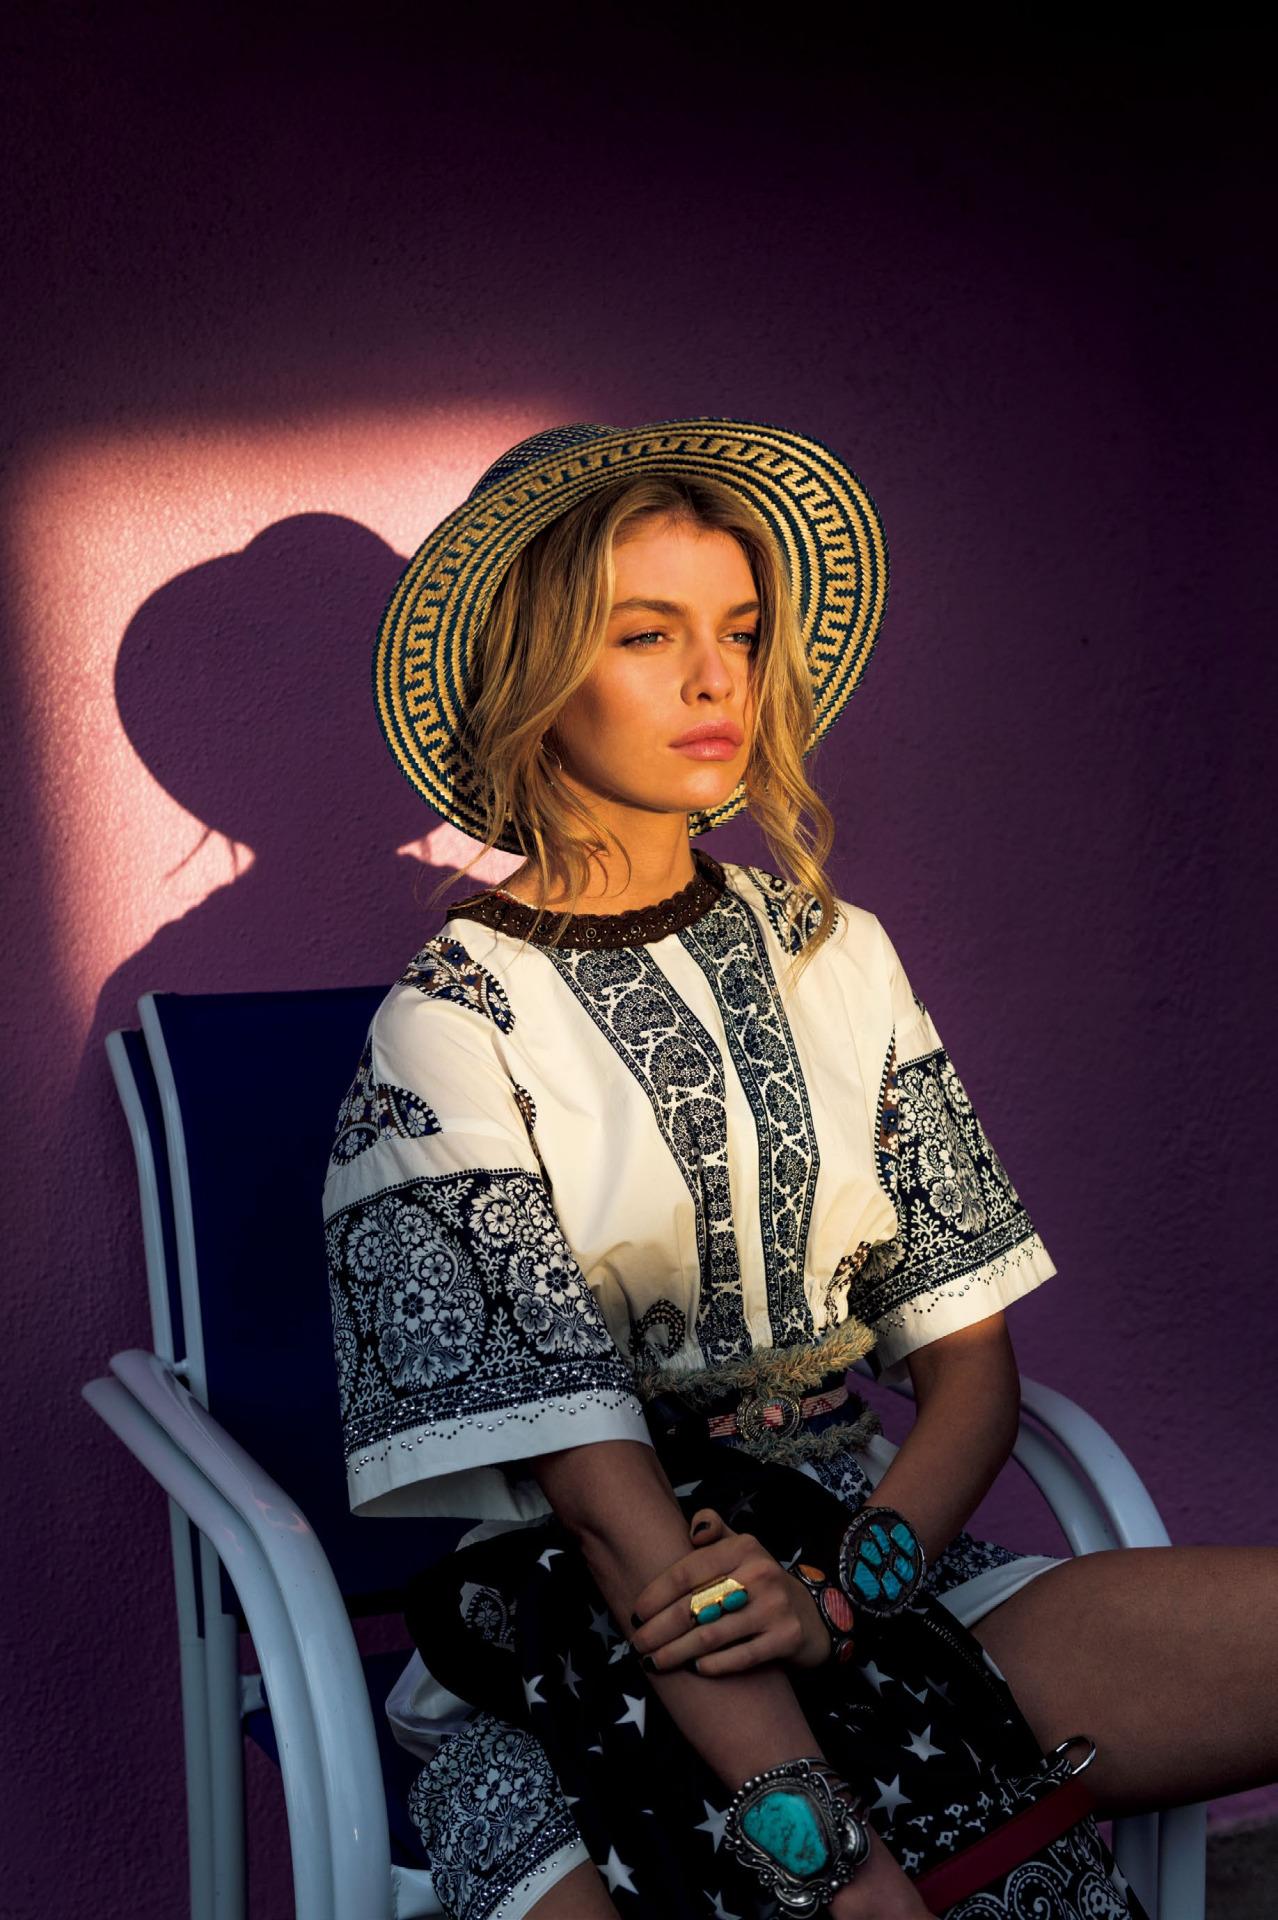 Stella Maxwell Vogue Japan July 2016